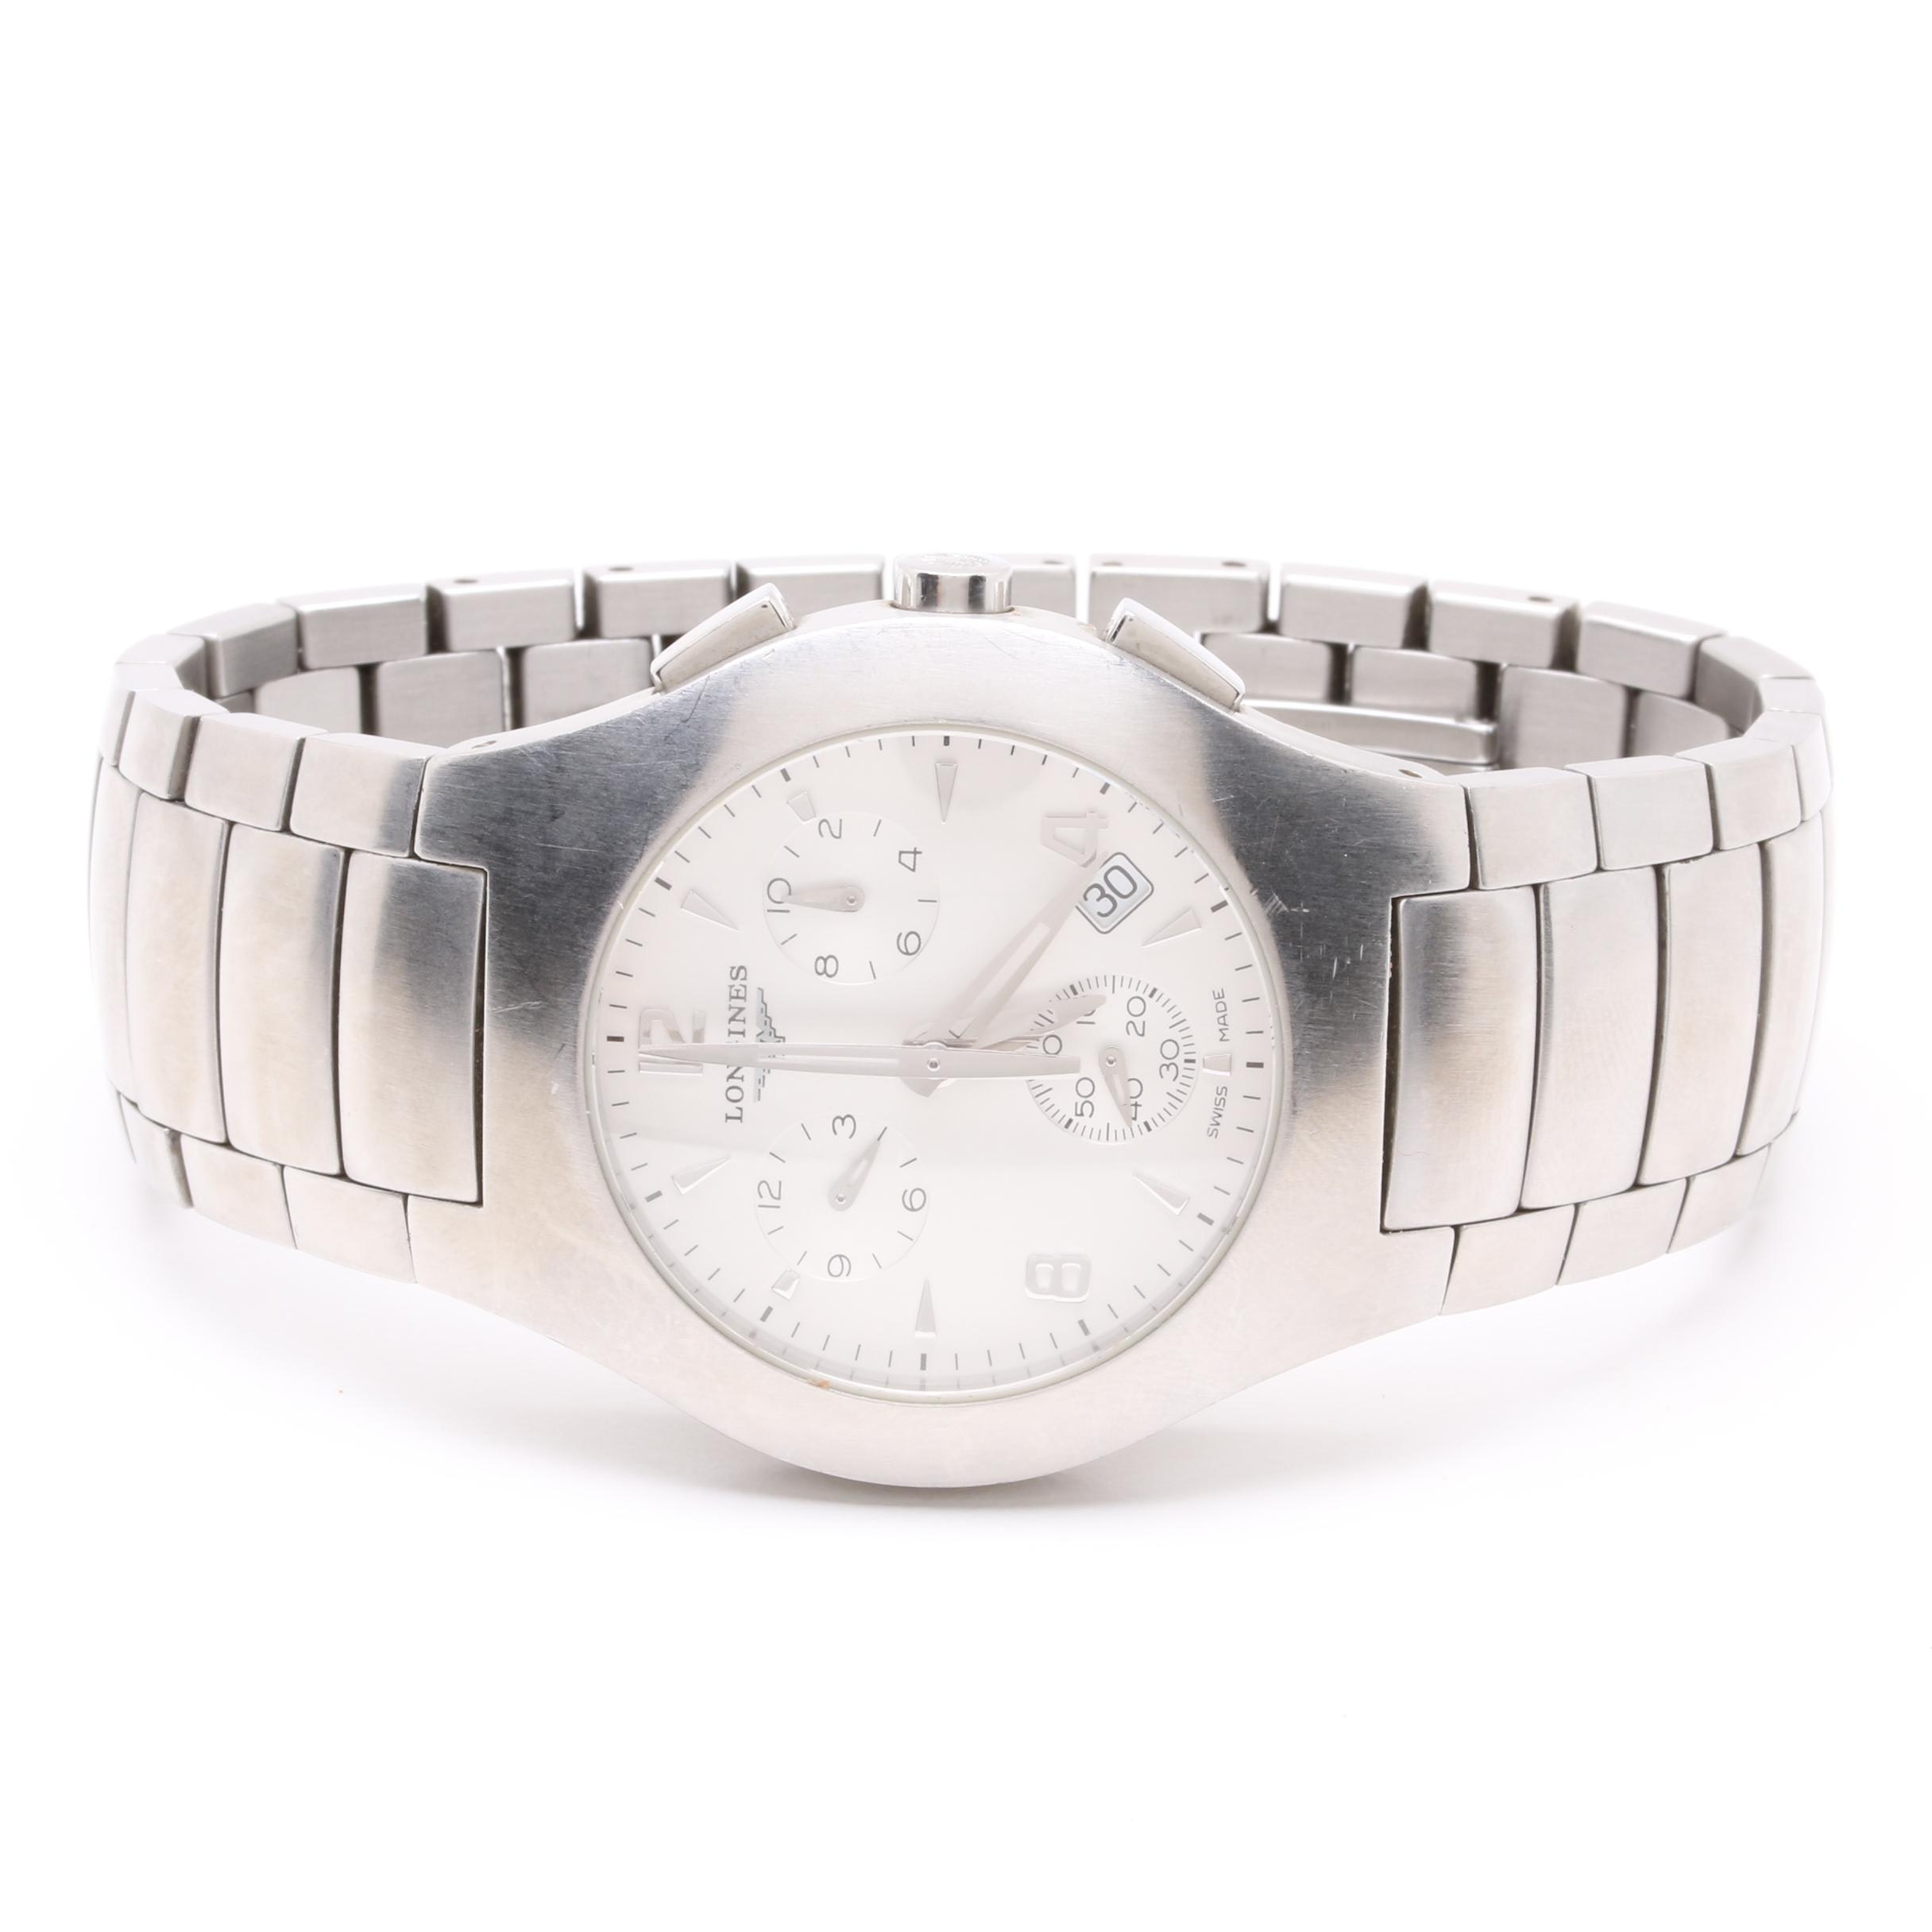 Longines Opposition Chronograph Stainless Steel Quartz Wristwatch